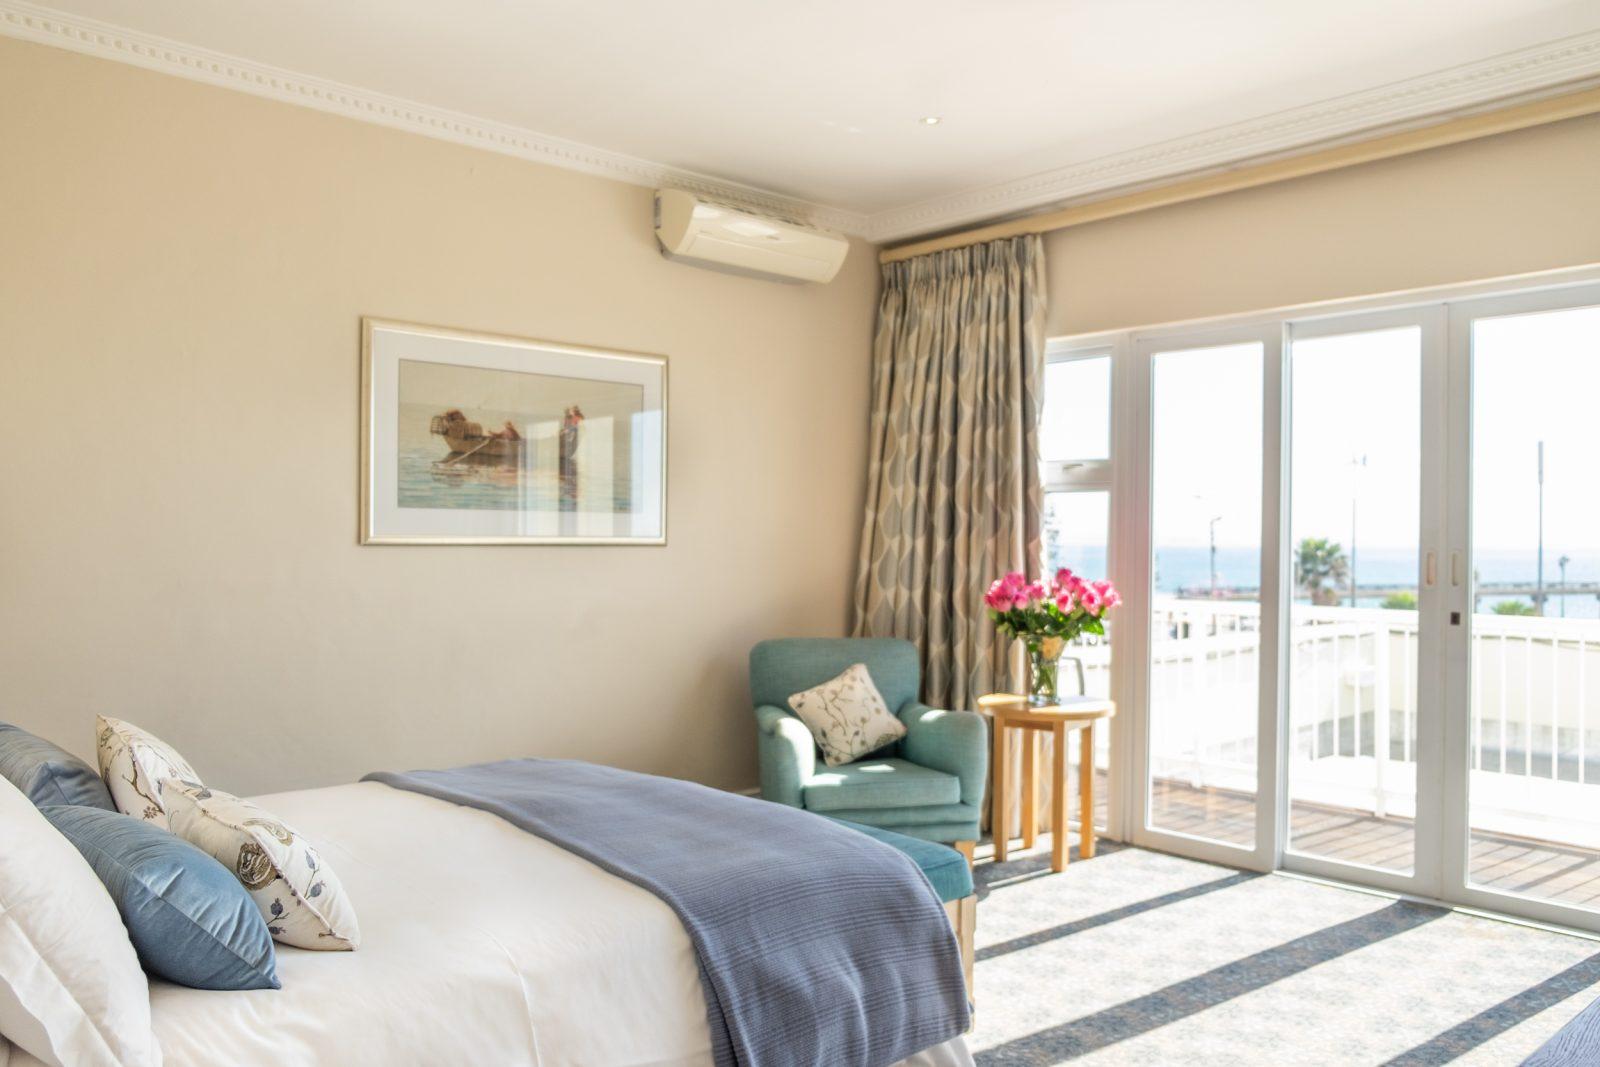 The Beach Hotel room